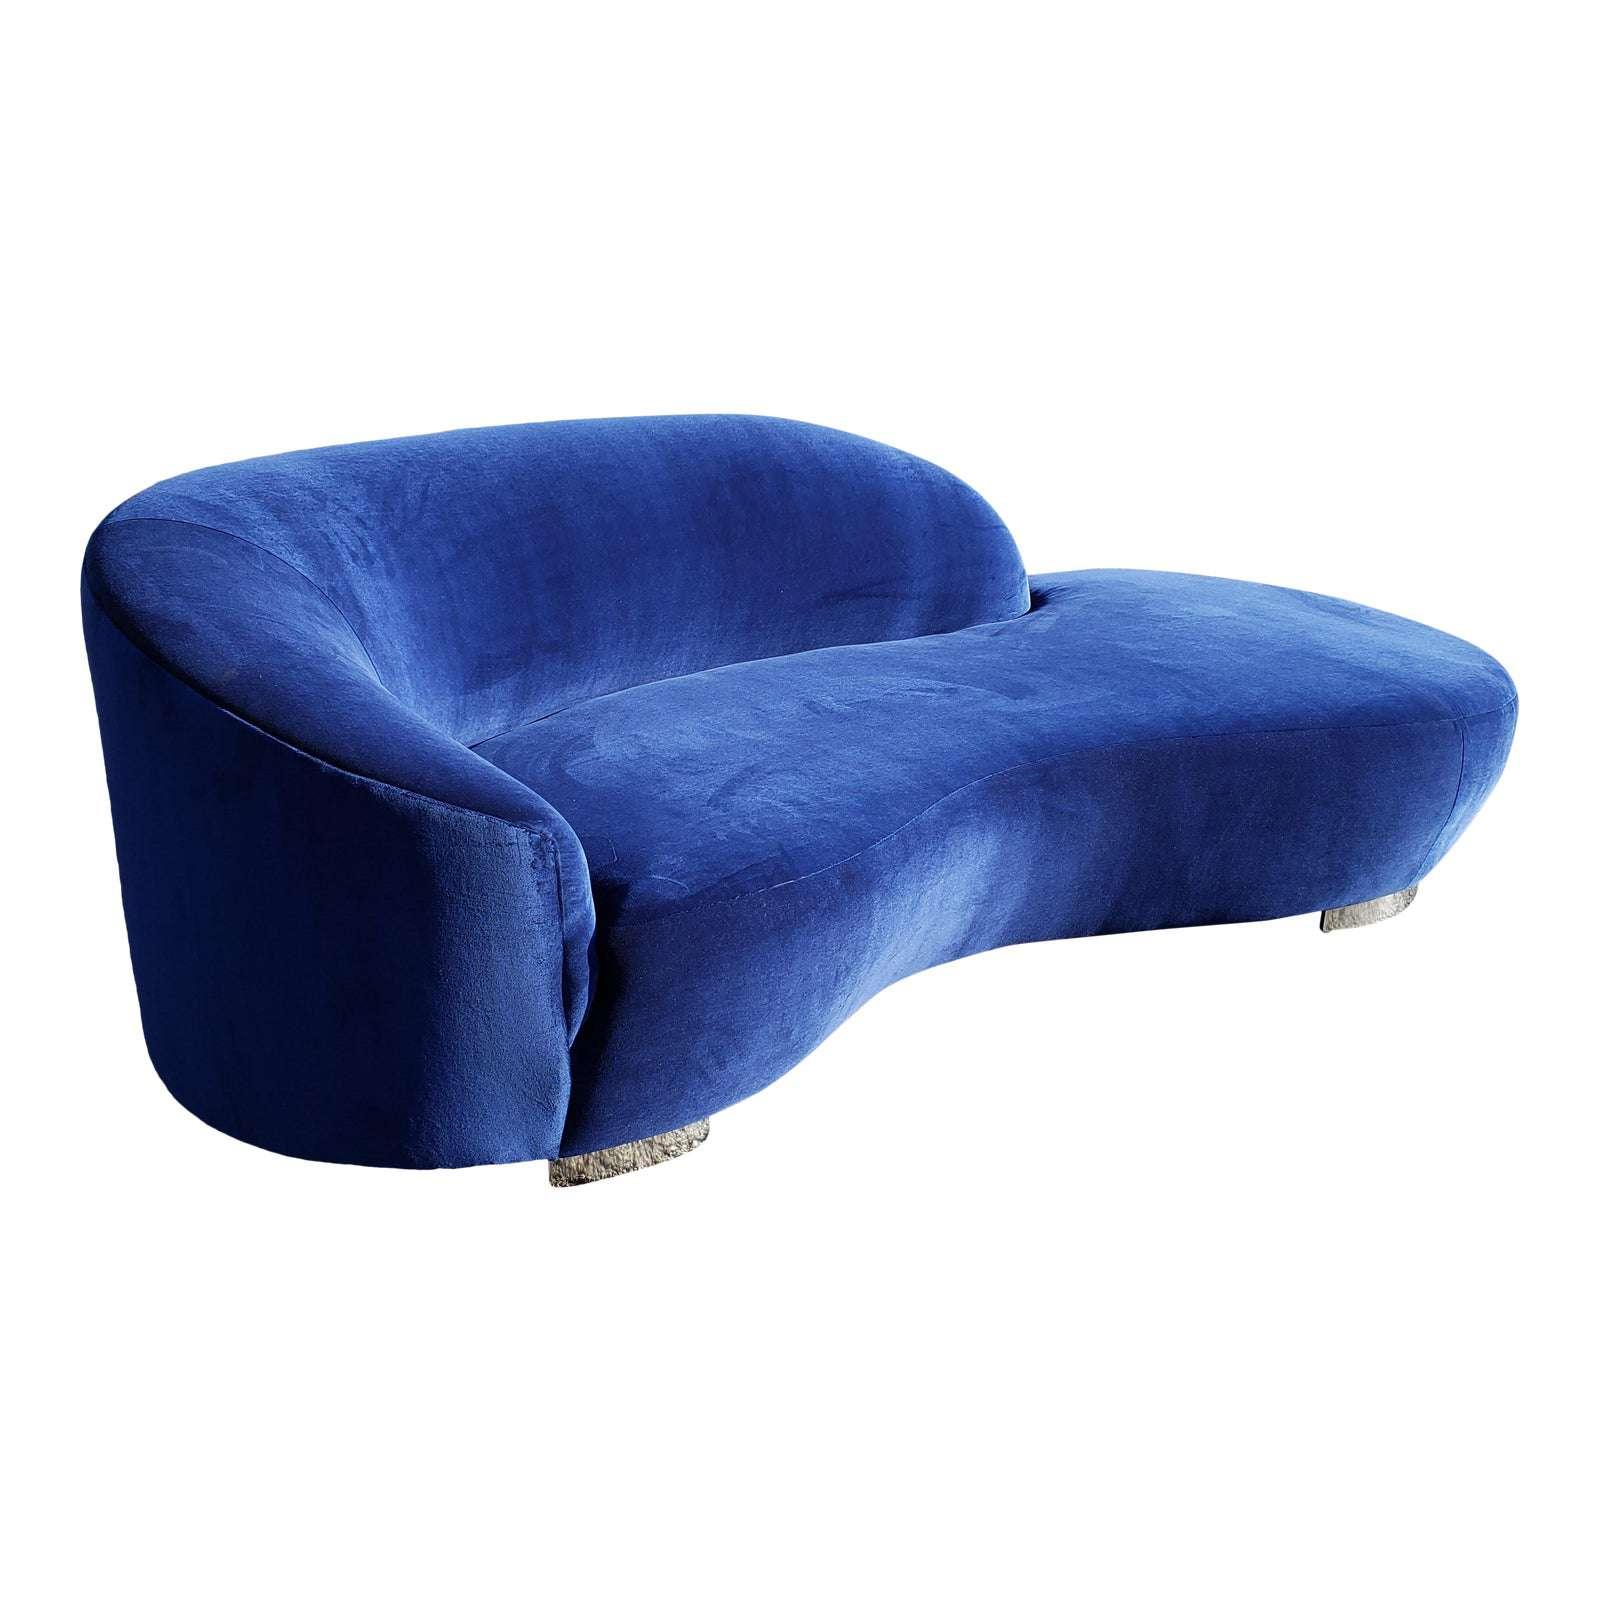 Vladimir Kagan Cloud Serpentine Sofa